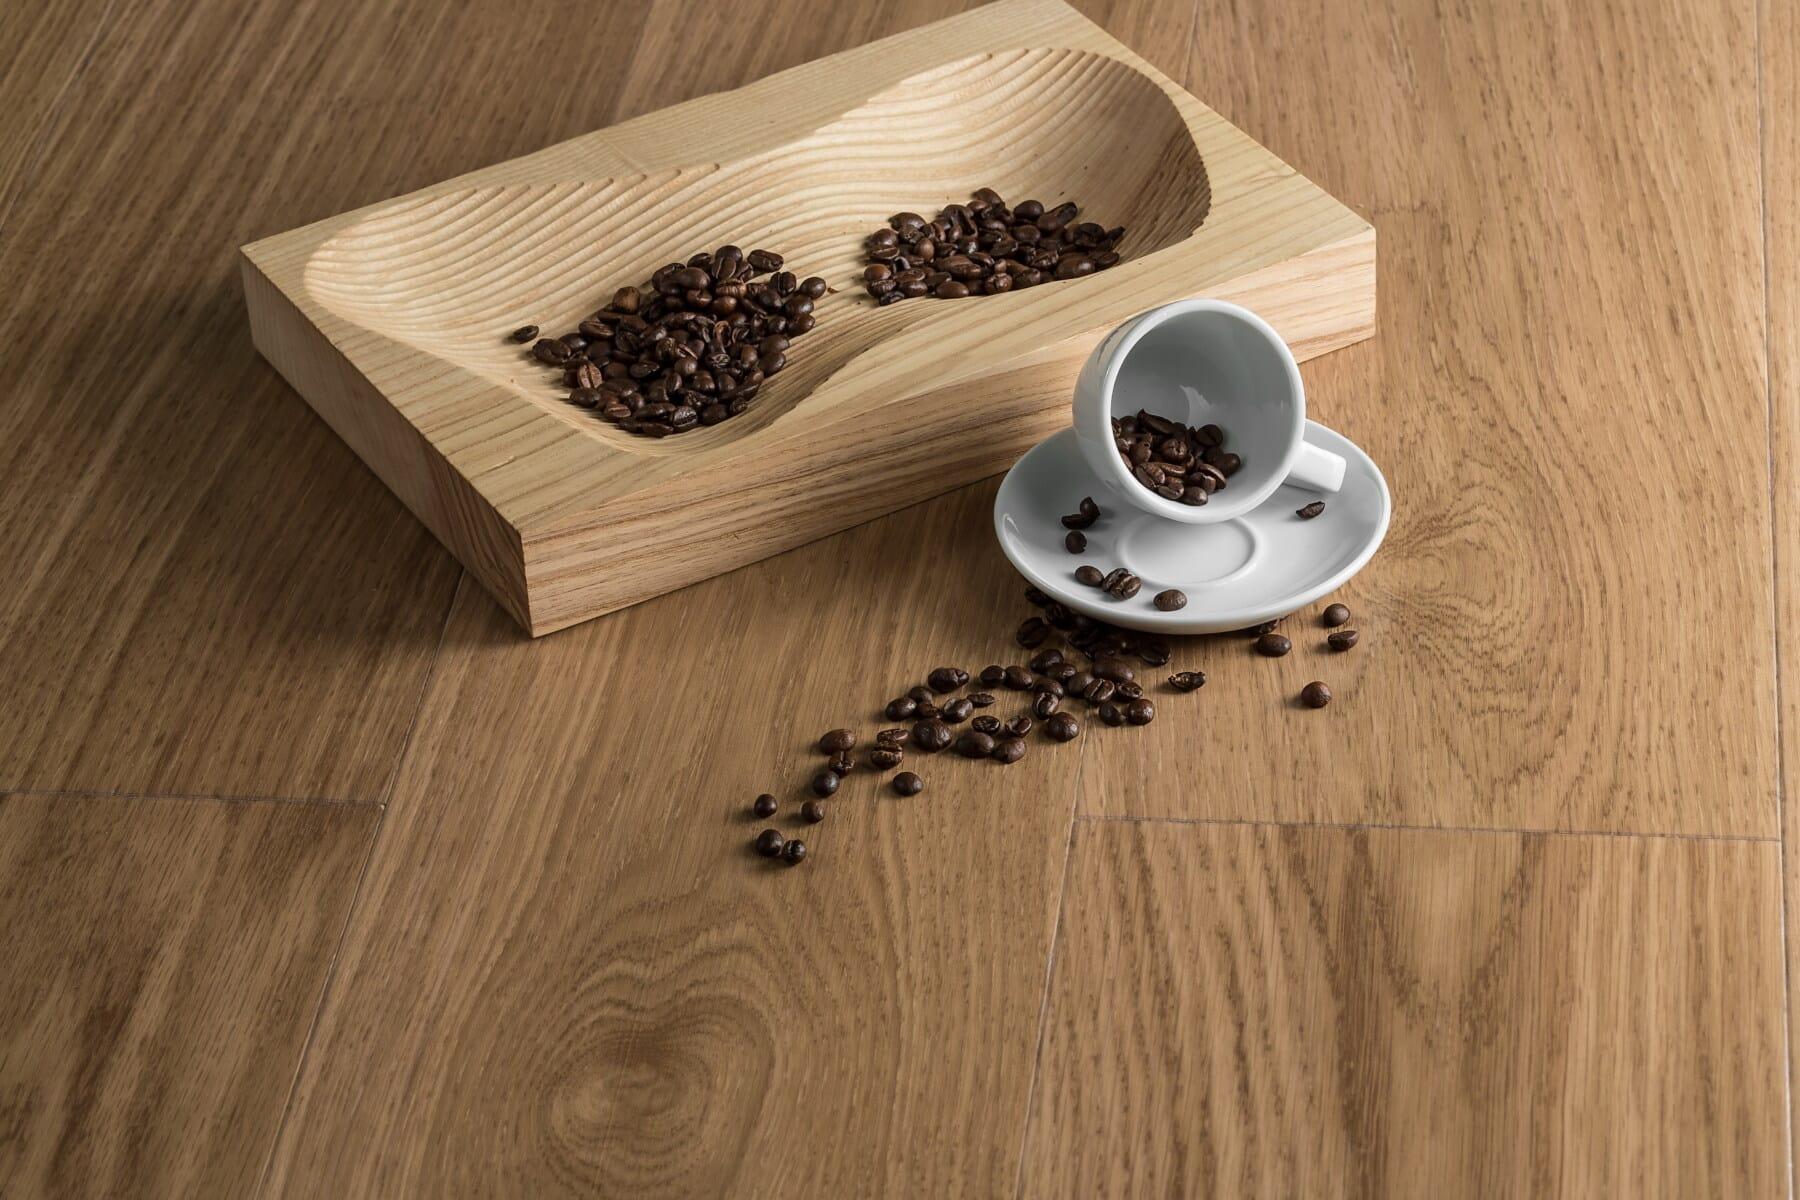 frø, mørk, Stege, kaffe, Kaffekop, brun, cappuccino, aroma, træ, koffein